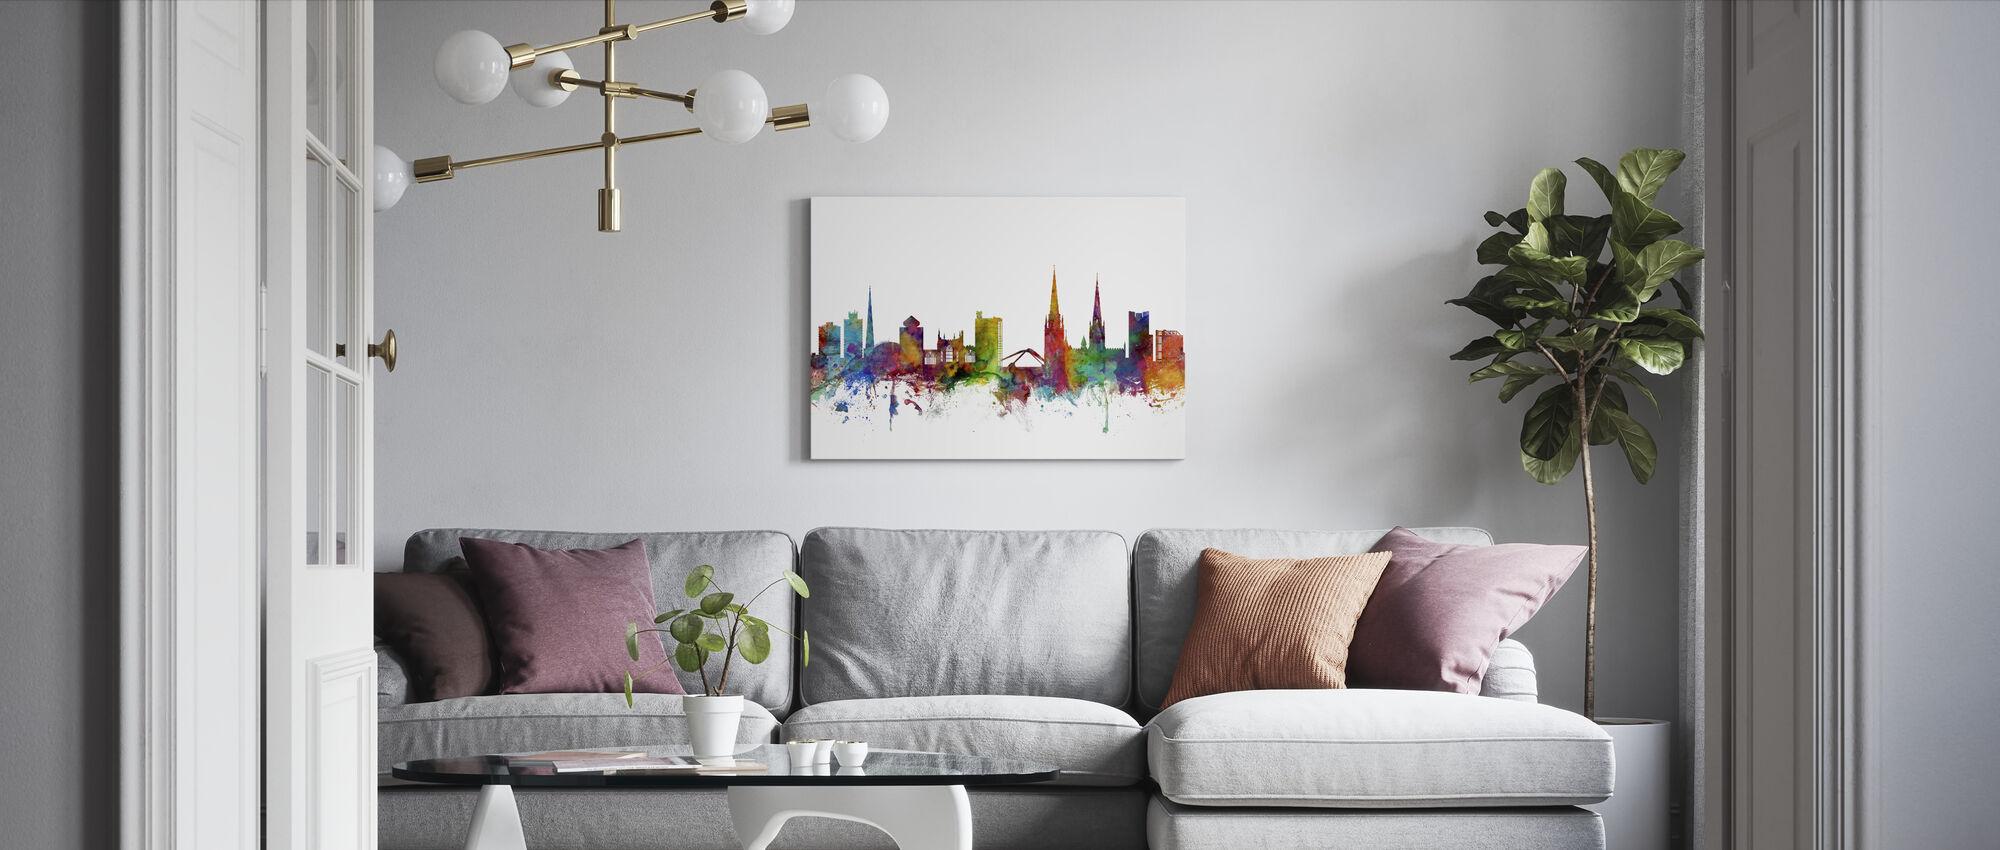 Coventry England Skyline - Canvas print - Living Room